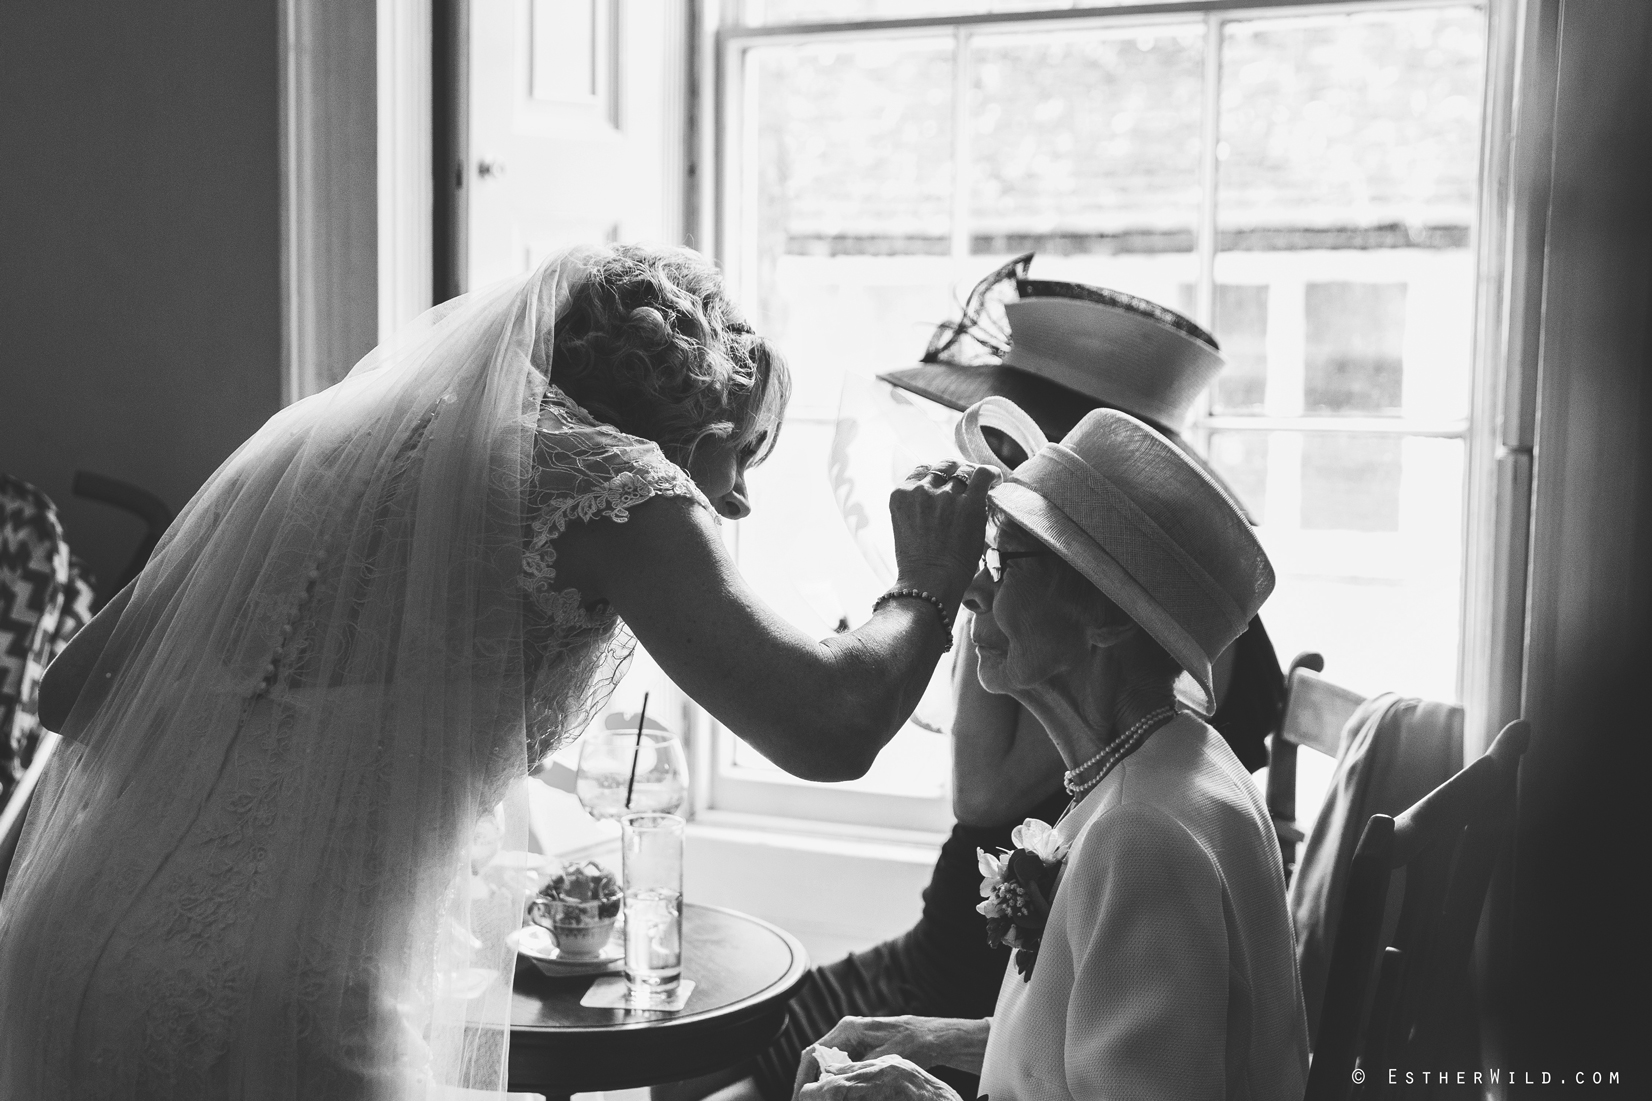 0817_Rathskellar_Kings_Lynn_East_Lexham_Church_Wedding_Photographer_Esther_Wild_IMG_1034-1.jpg